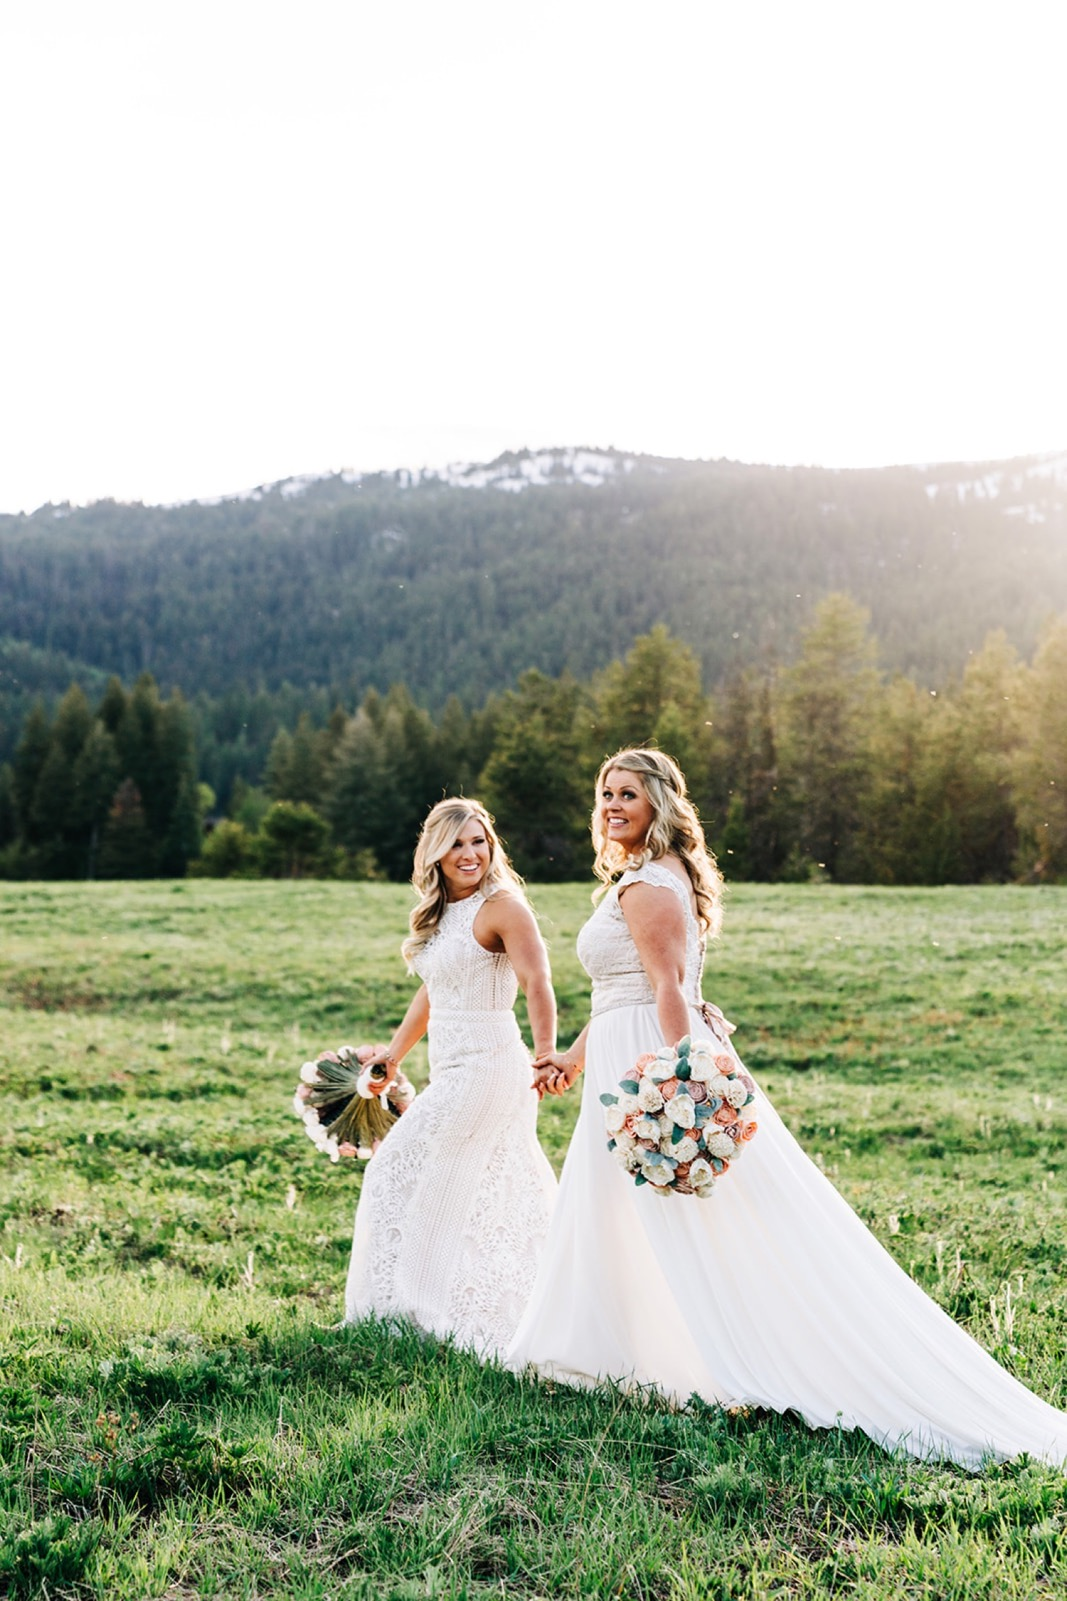 170_falissa_heather_wedding-486.jpg